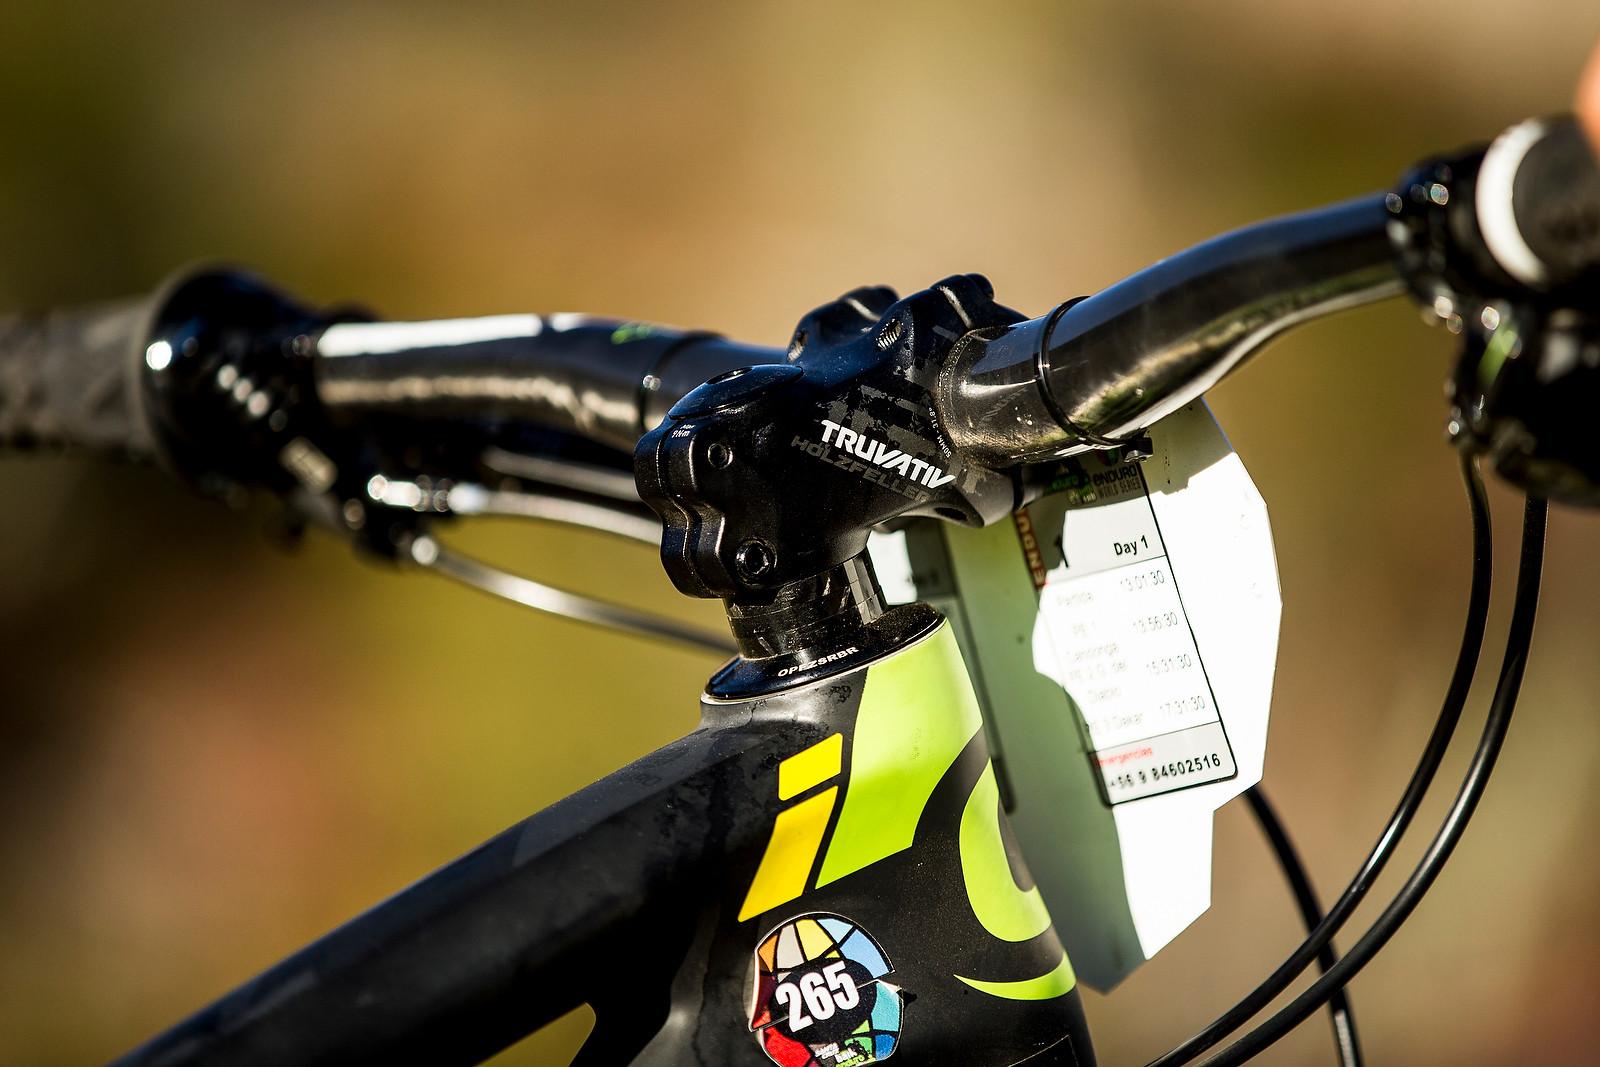 WINNING BIKE: Jerome Clementz's Cannondale Jekyll 27.5 - WINNING BIKE: Jerome Clementz's Cannondale Jekyll 27.5 - Mountain Biking Pictures - Vital MTB